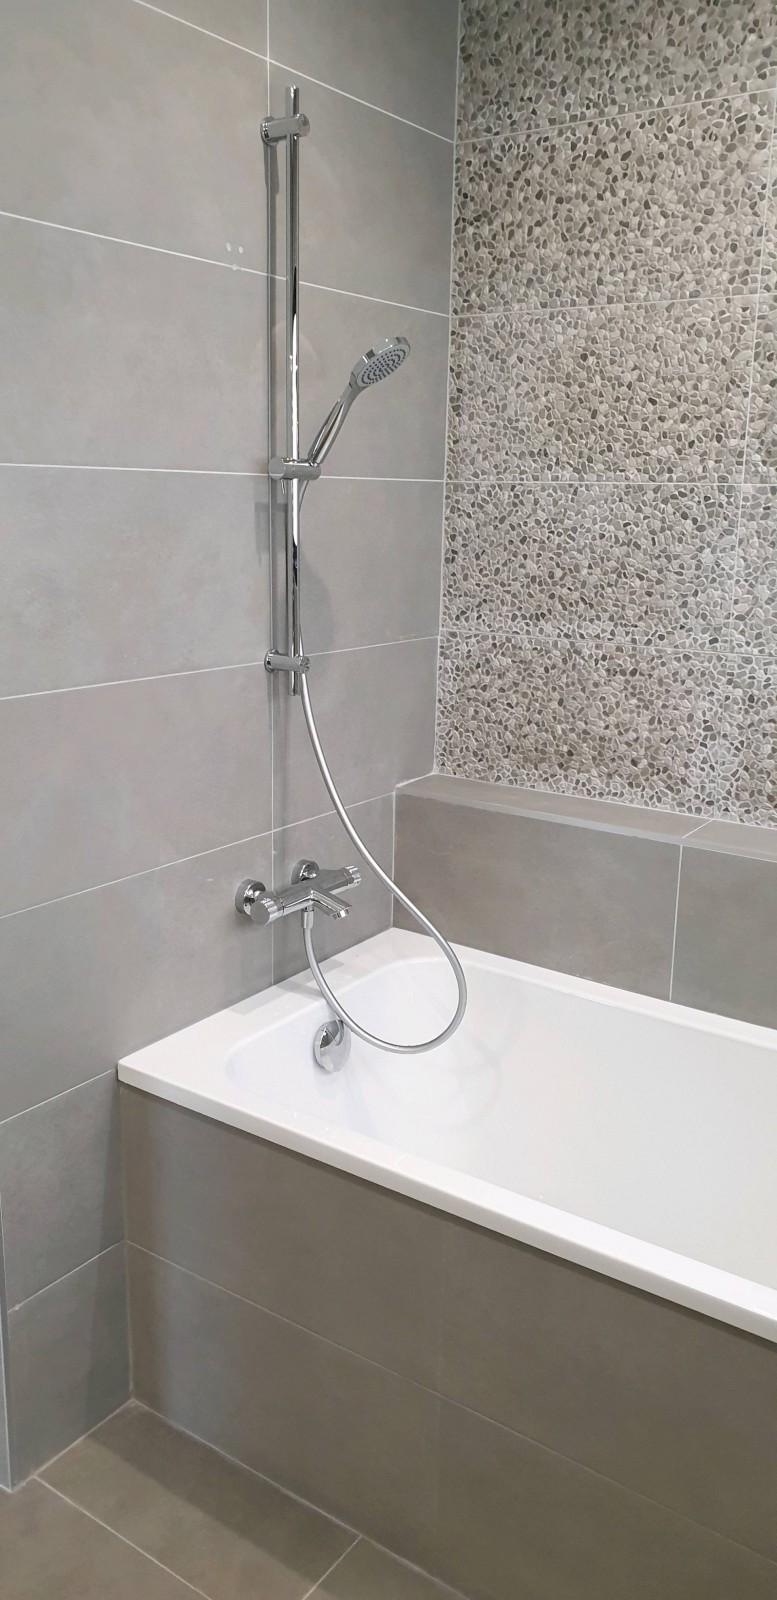 Moderniser Salle De Bain moderniser une salle de bain avec une baignoire et meuble